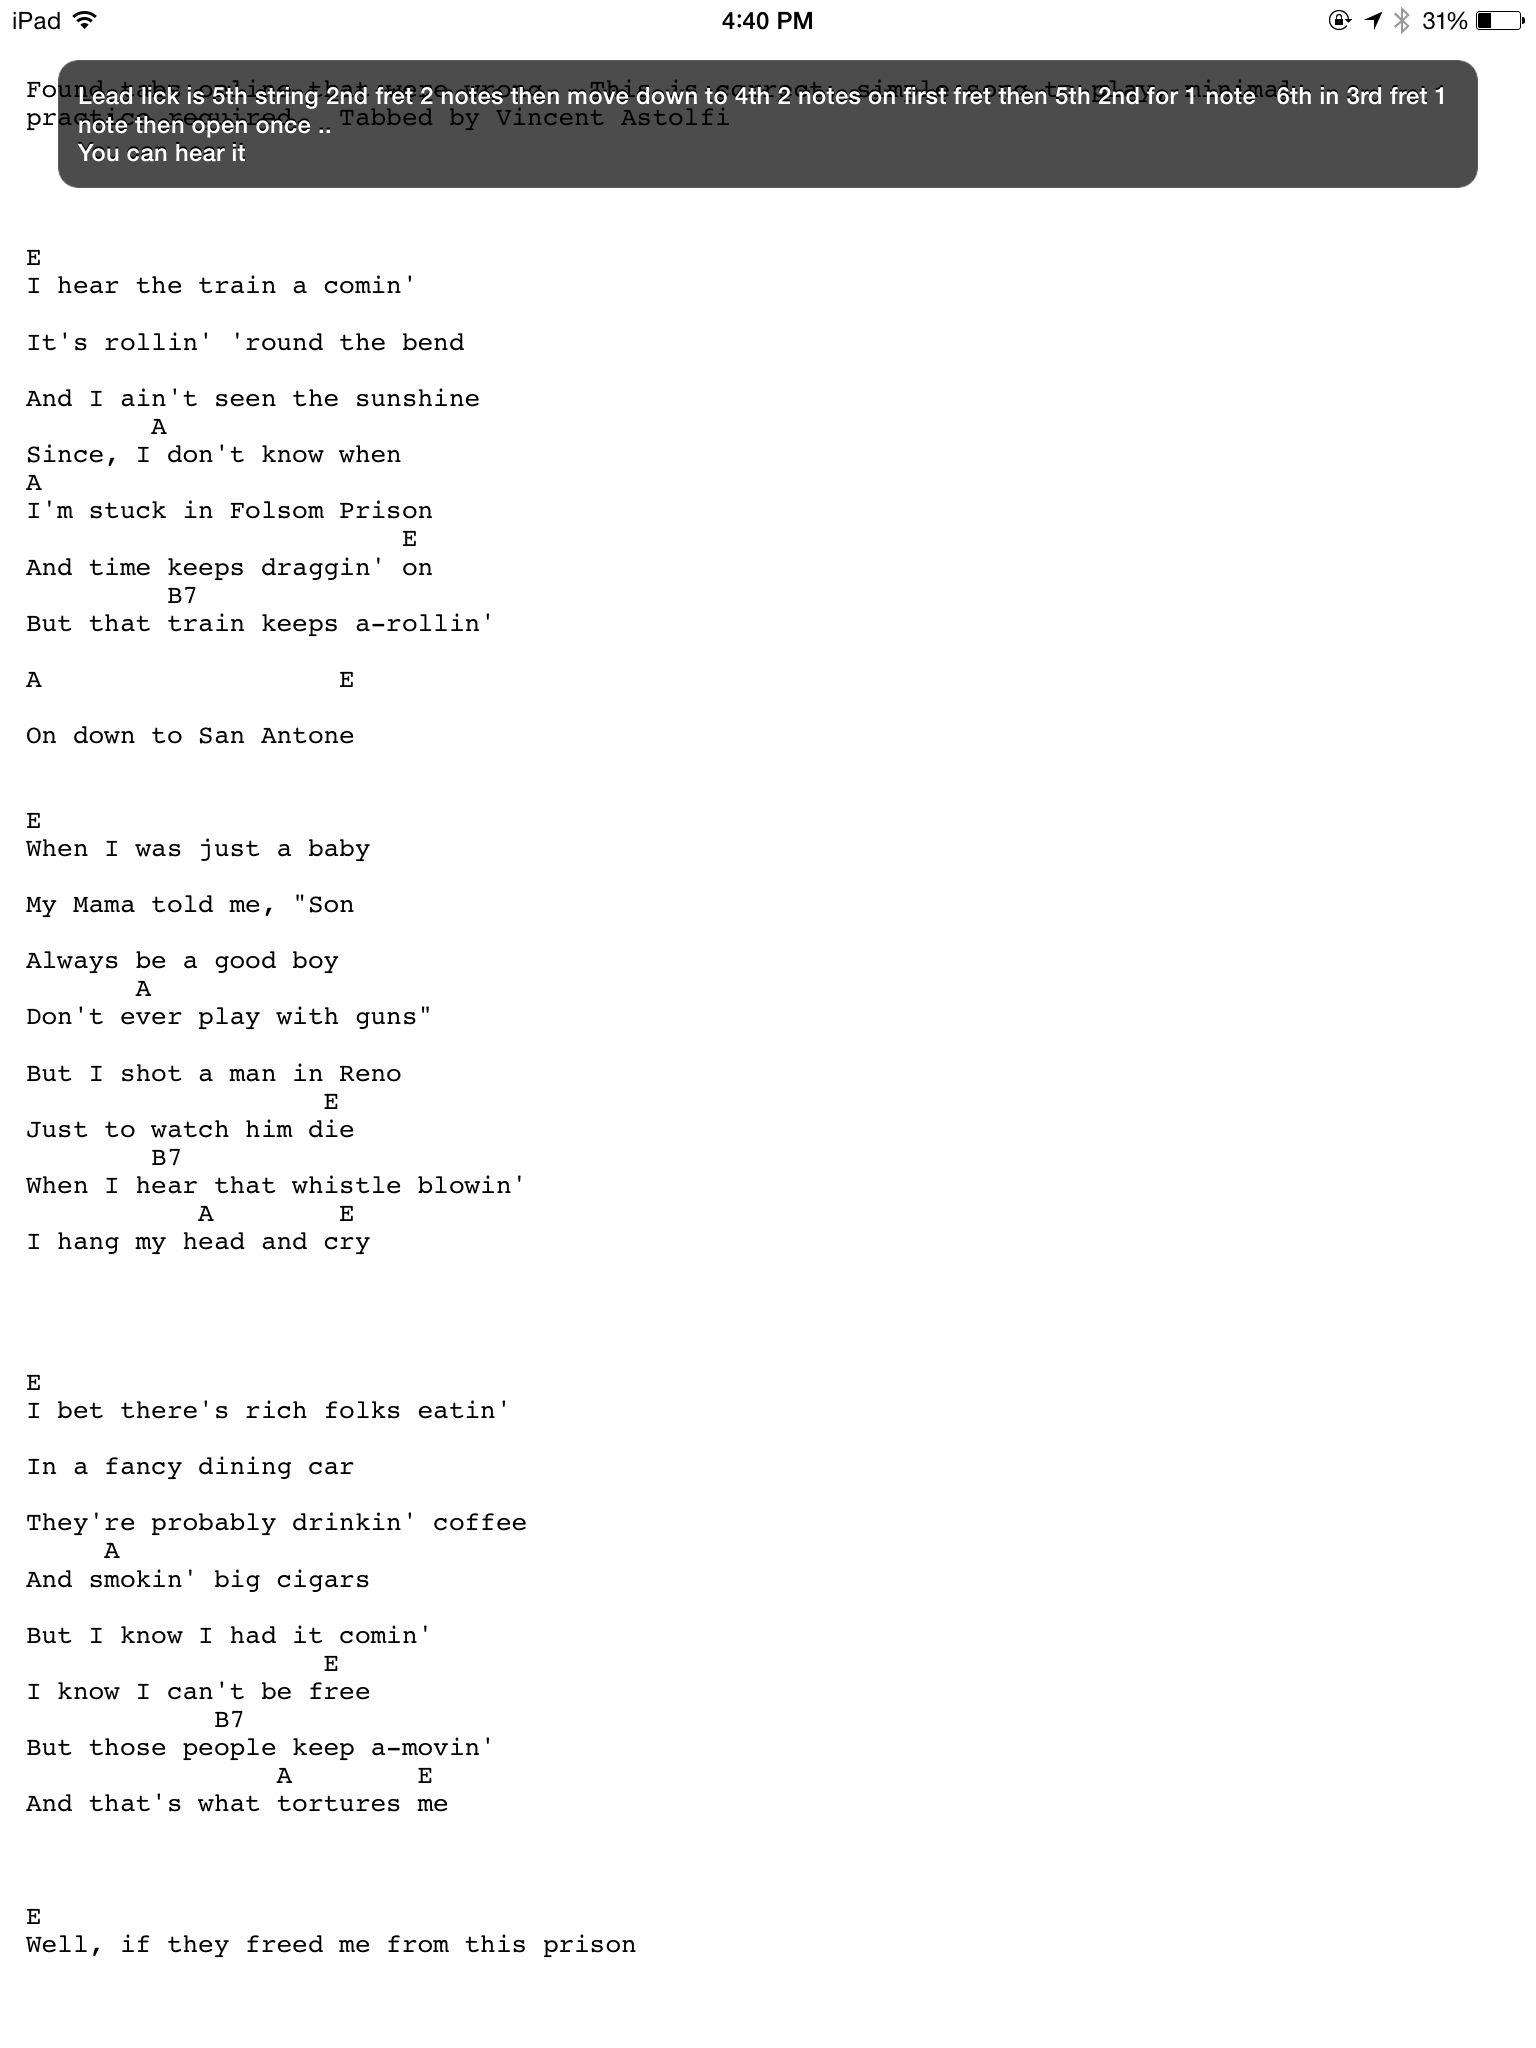 Folsom prison blues some of my favorite tabs pinterest songs folsom prison blues hexwebz Images